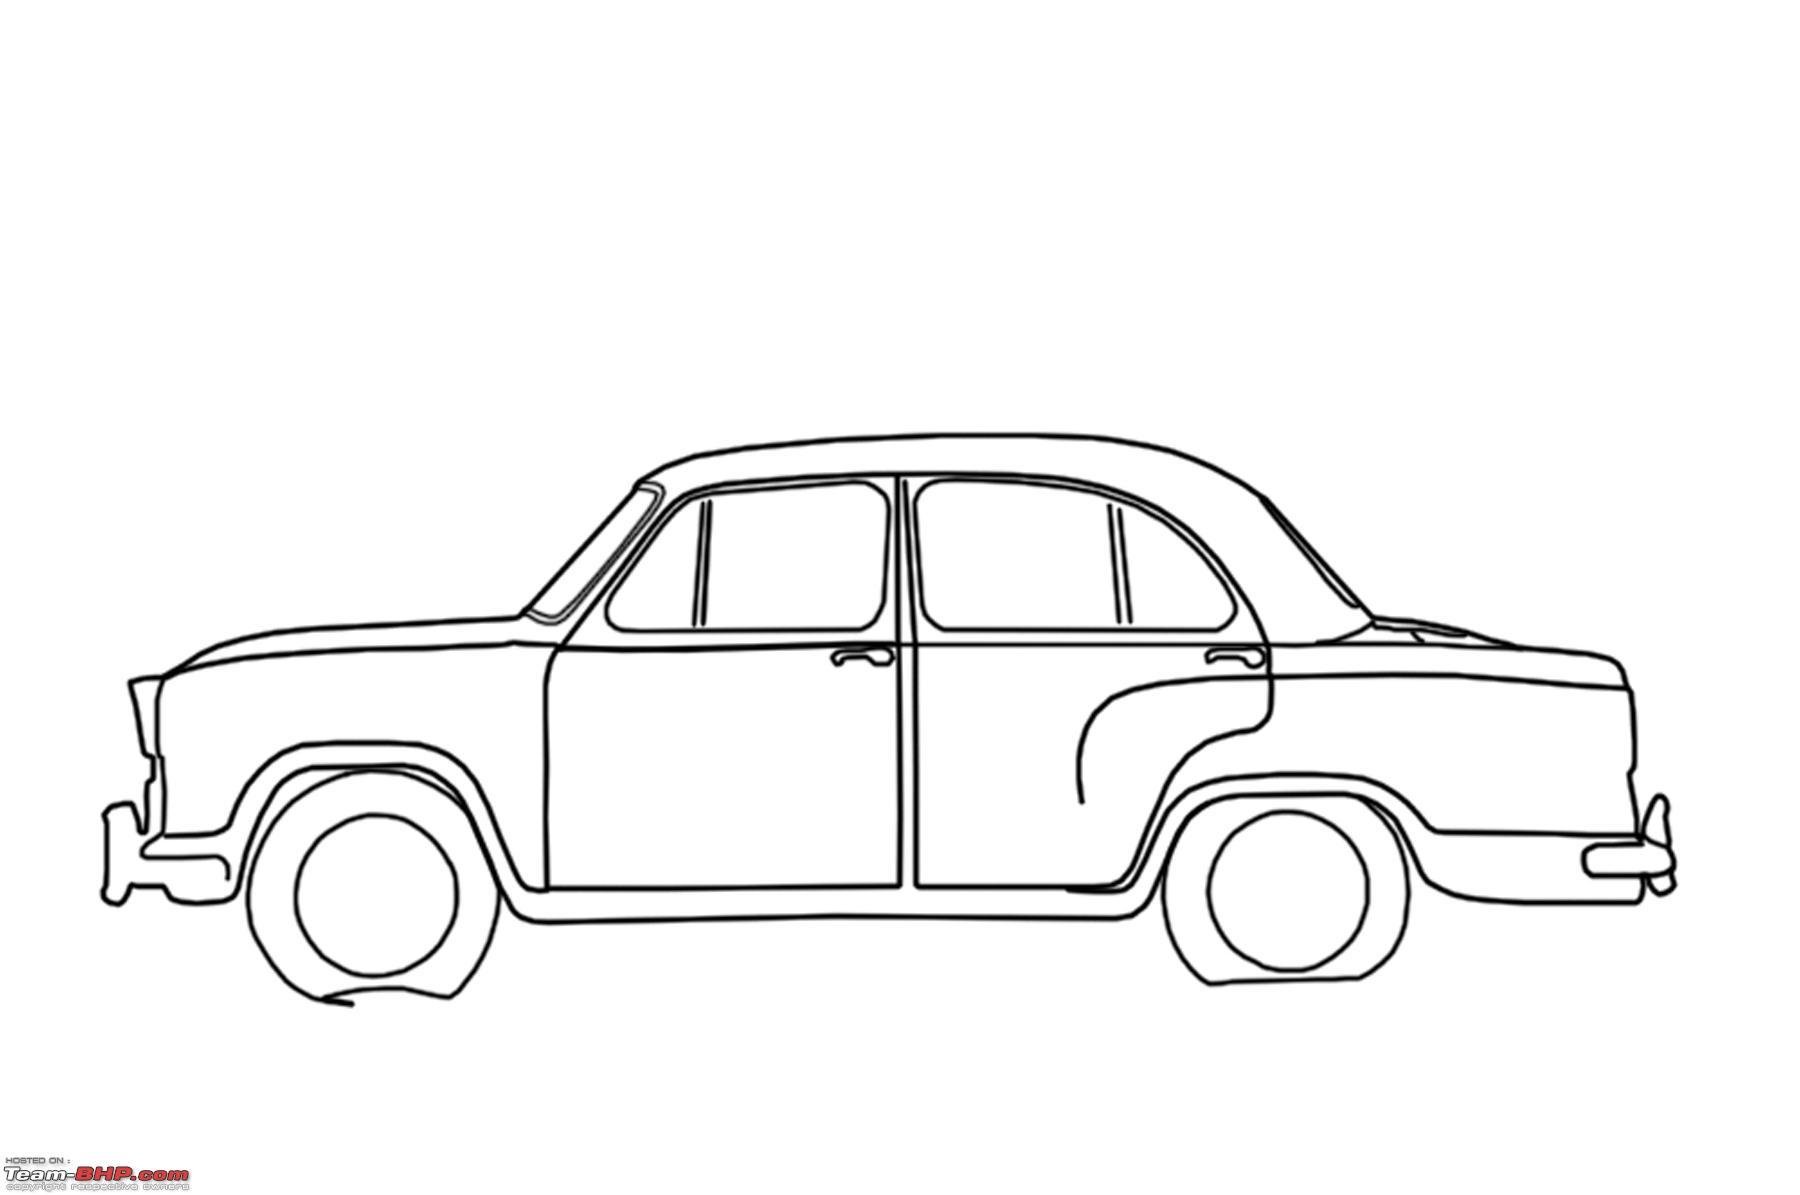 Concept Car Design Drawing No Hd Photos Car Drawings In